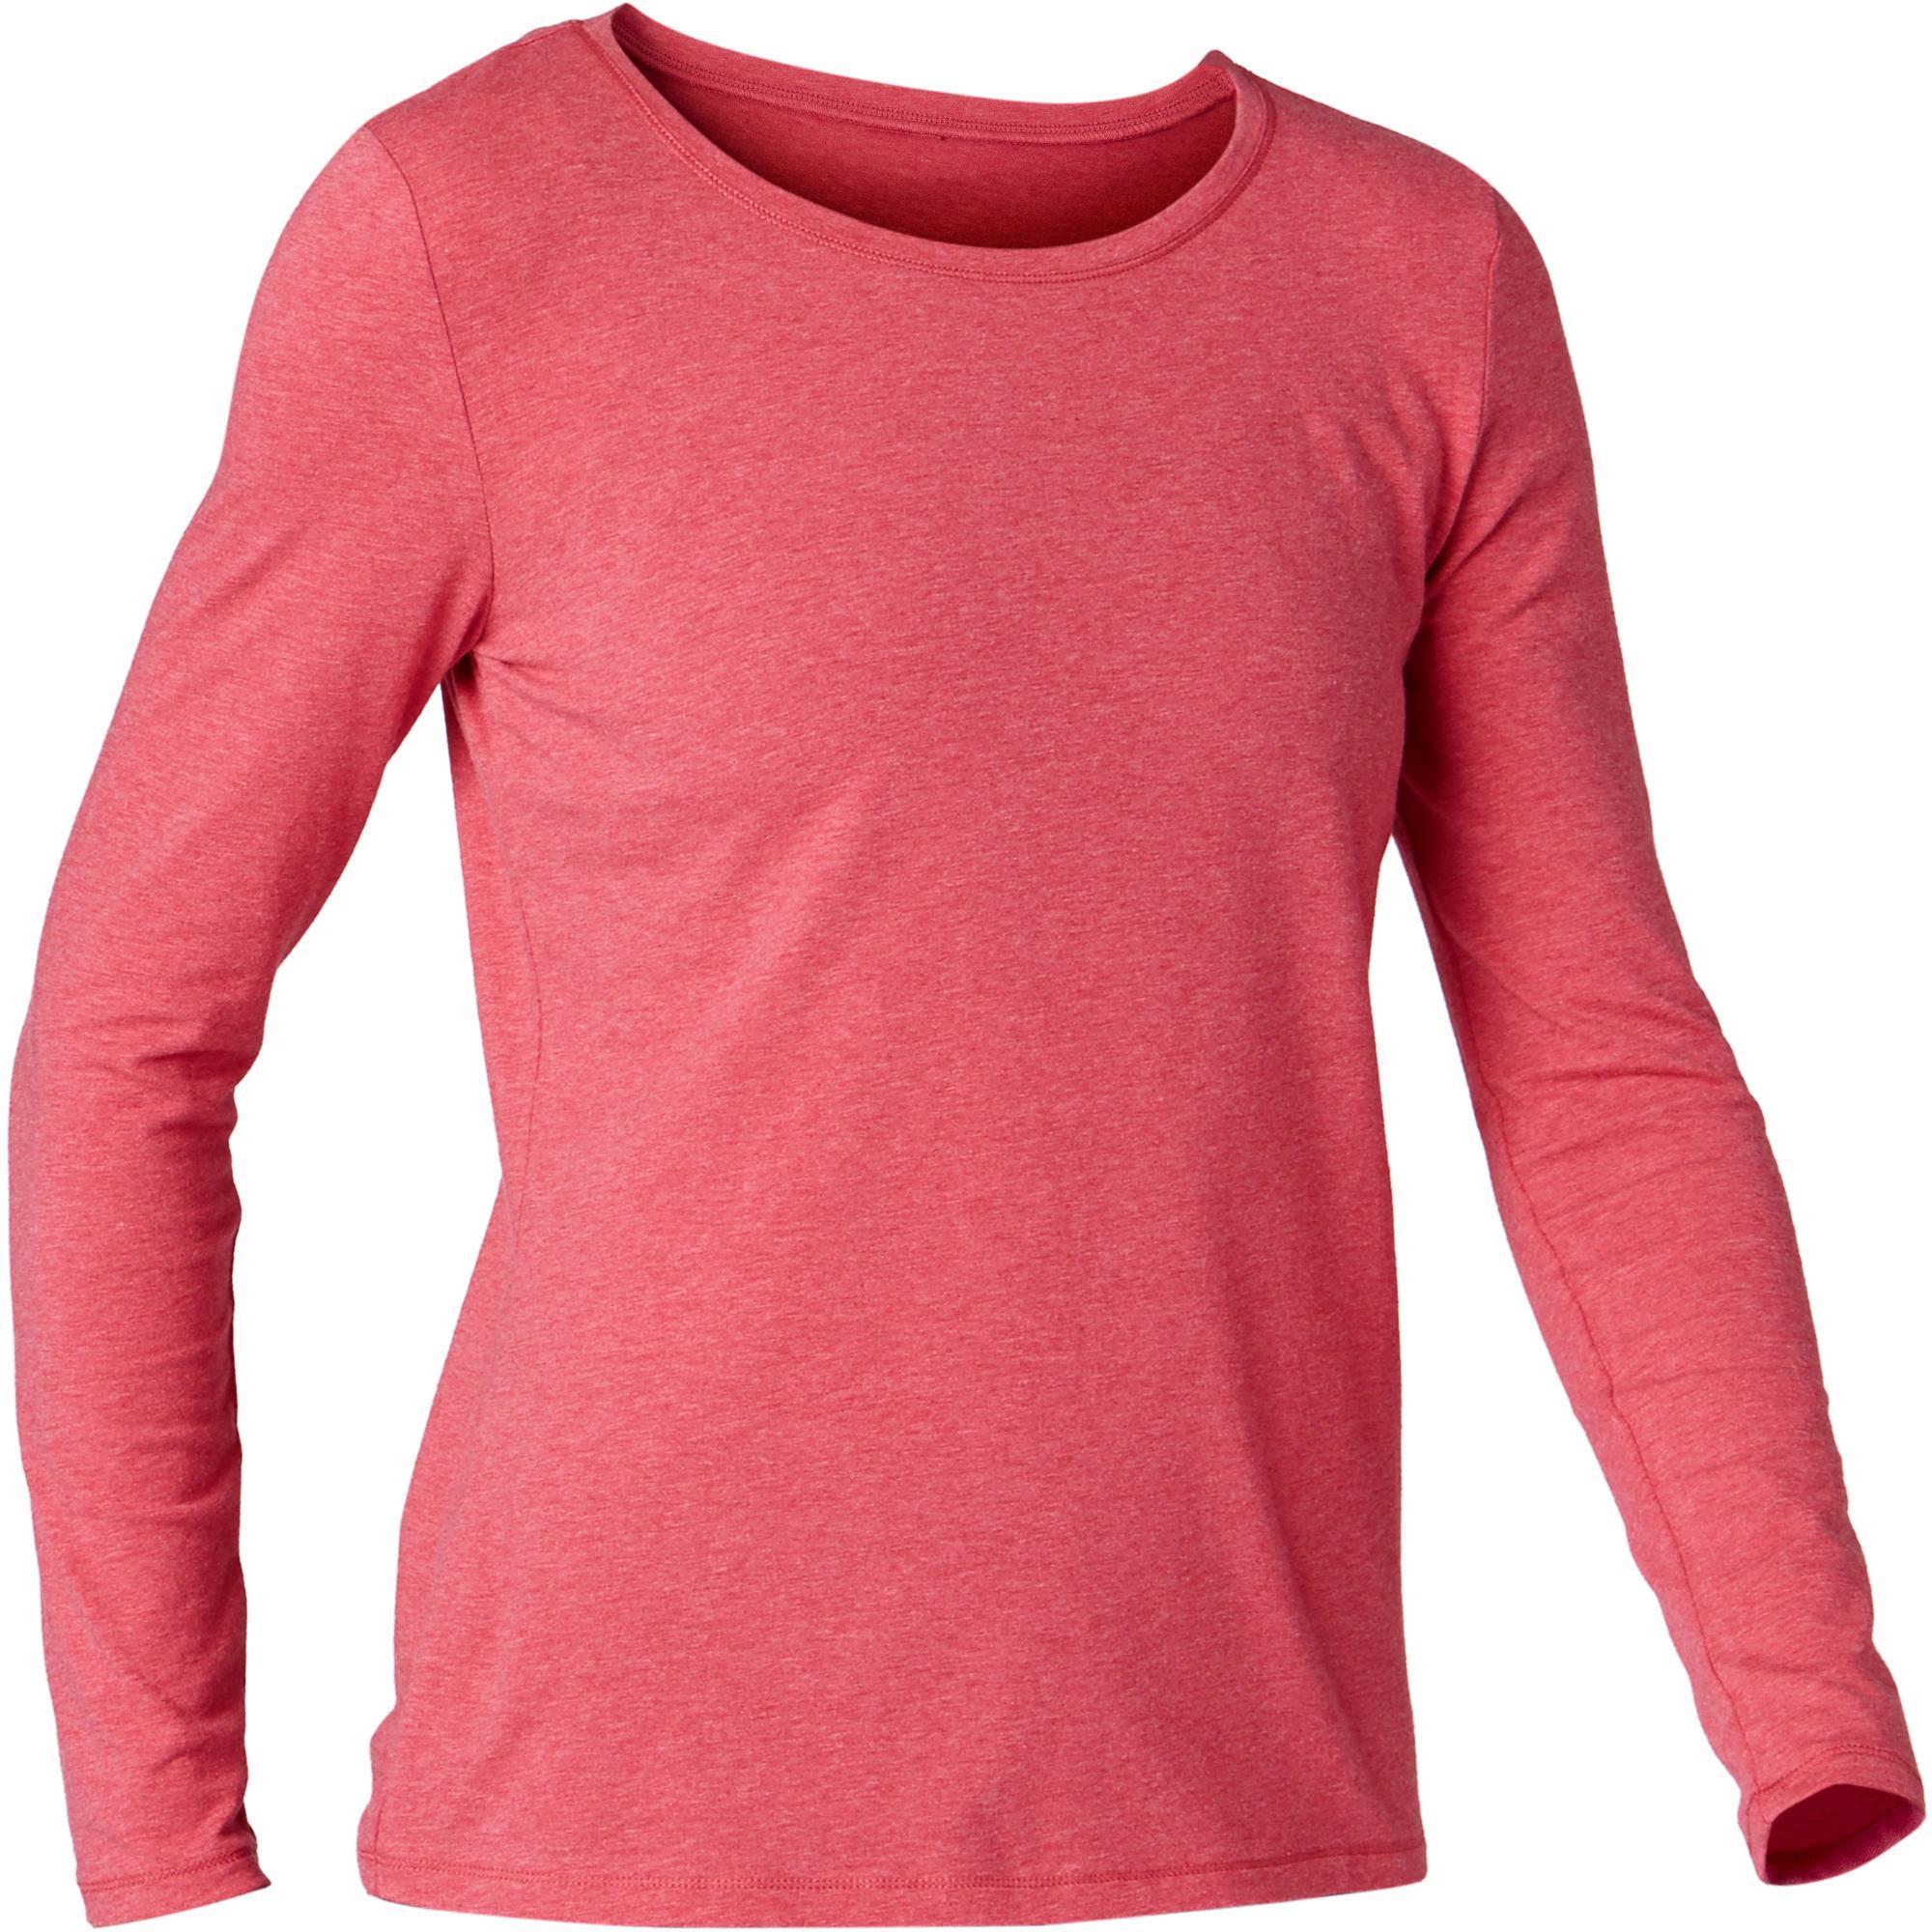 8af594ec83d2 100 Women's Long-Sleeved Gentle Gym & Pilates T-Shirt - Dark Mottled Pink |  Domyos by Decathlon